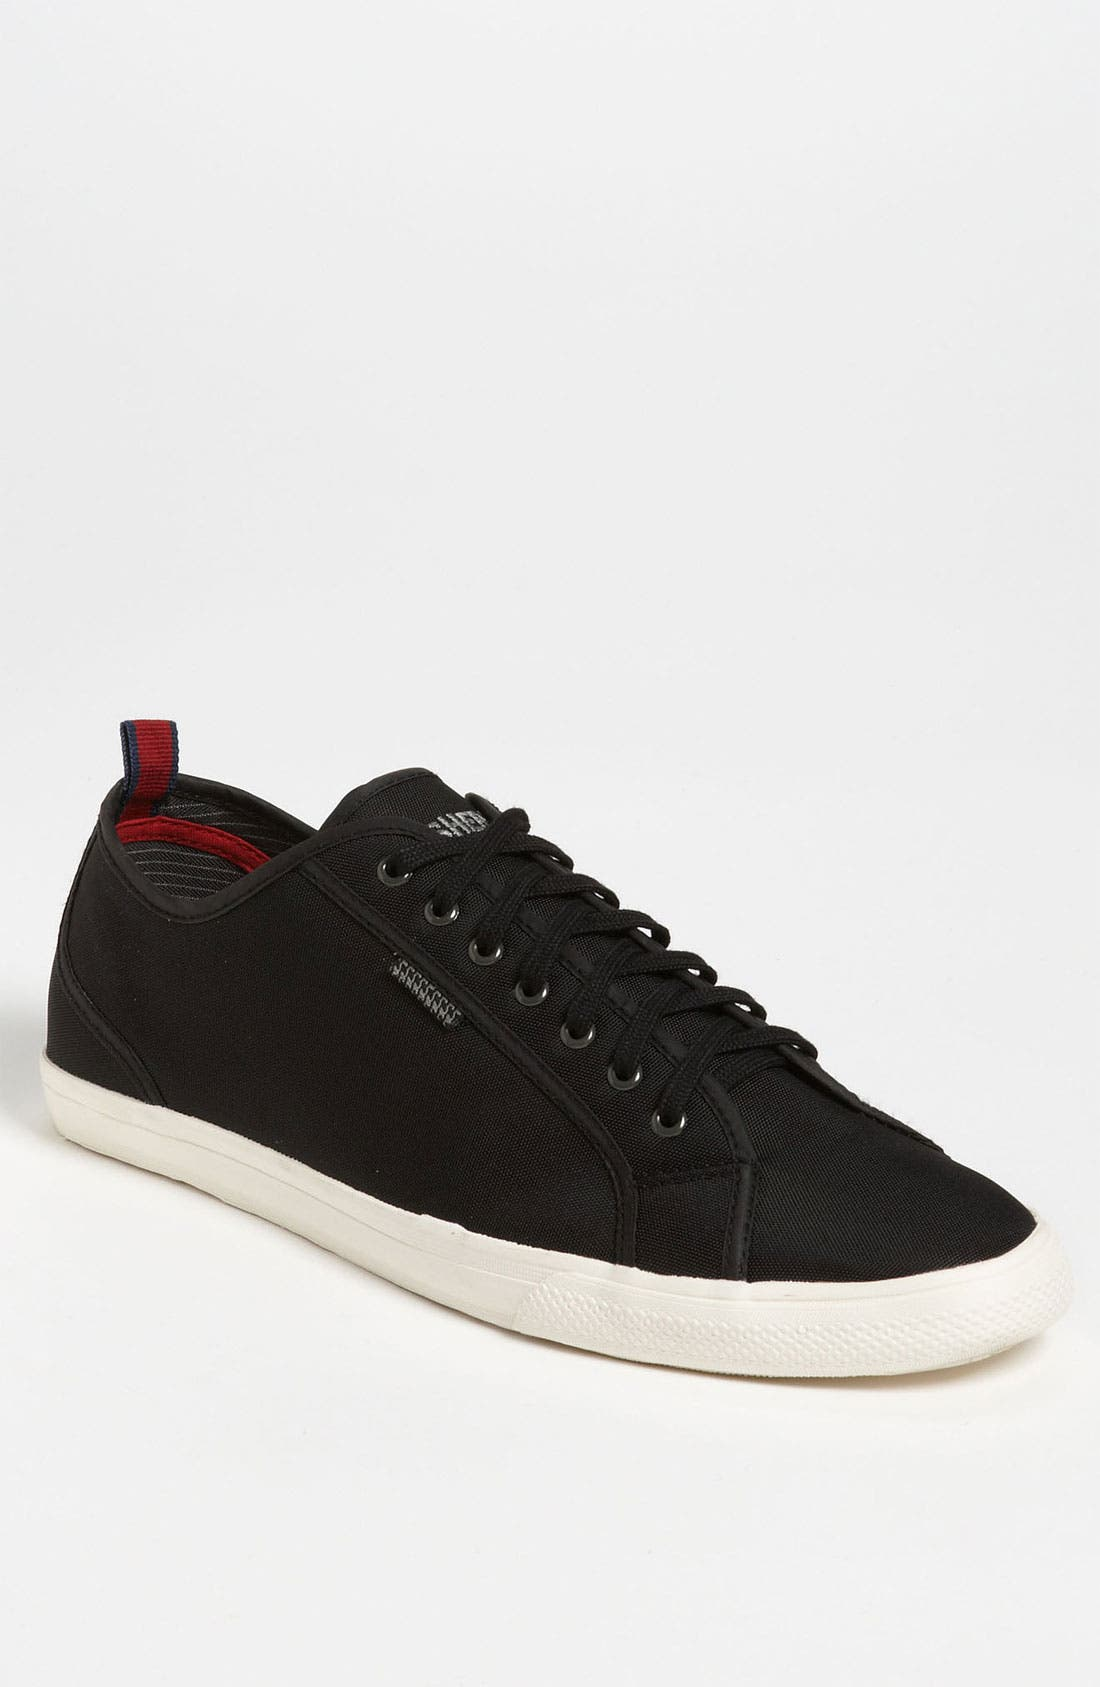 Alternate Image 1 Selected - Ben Sherman 'Breckon' Sneaker